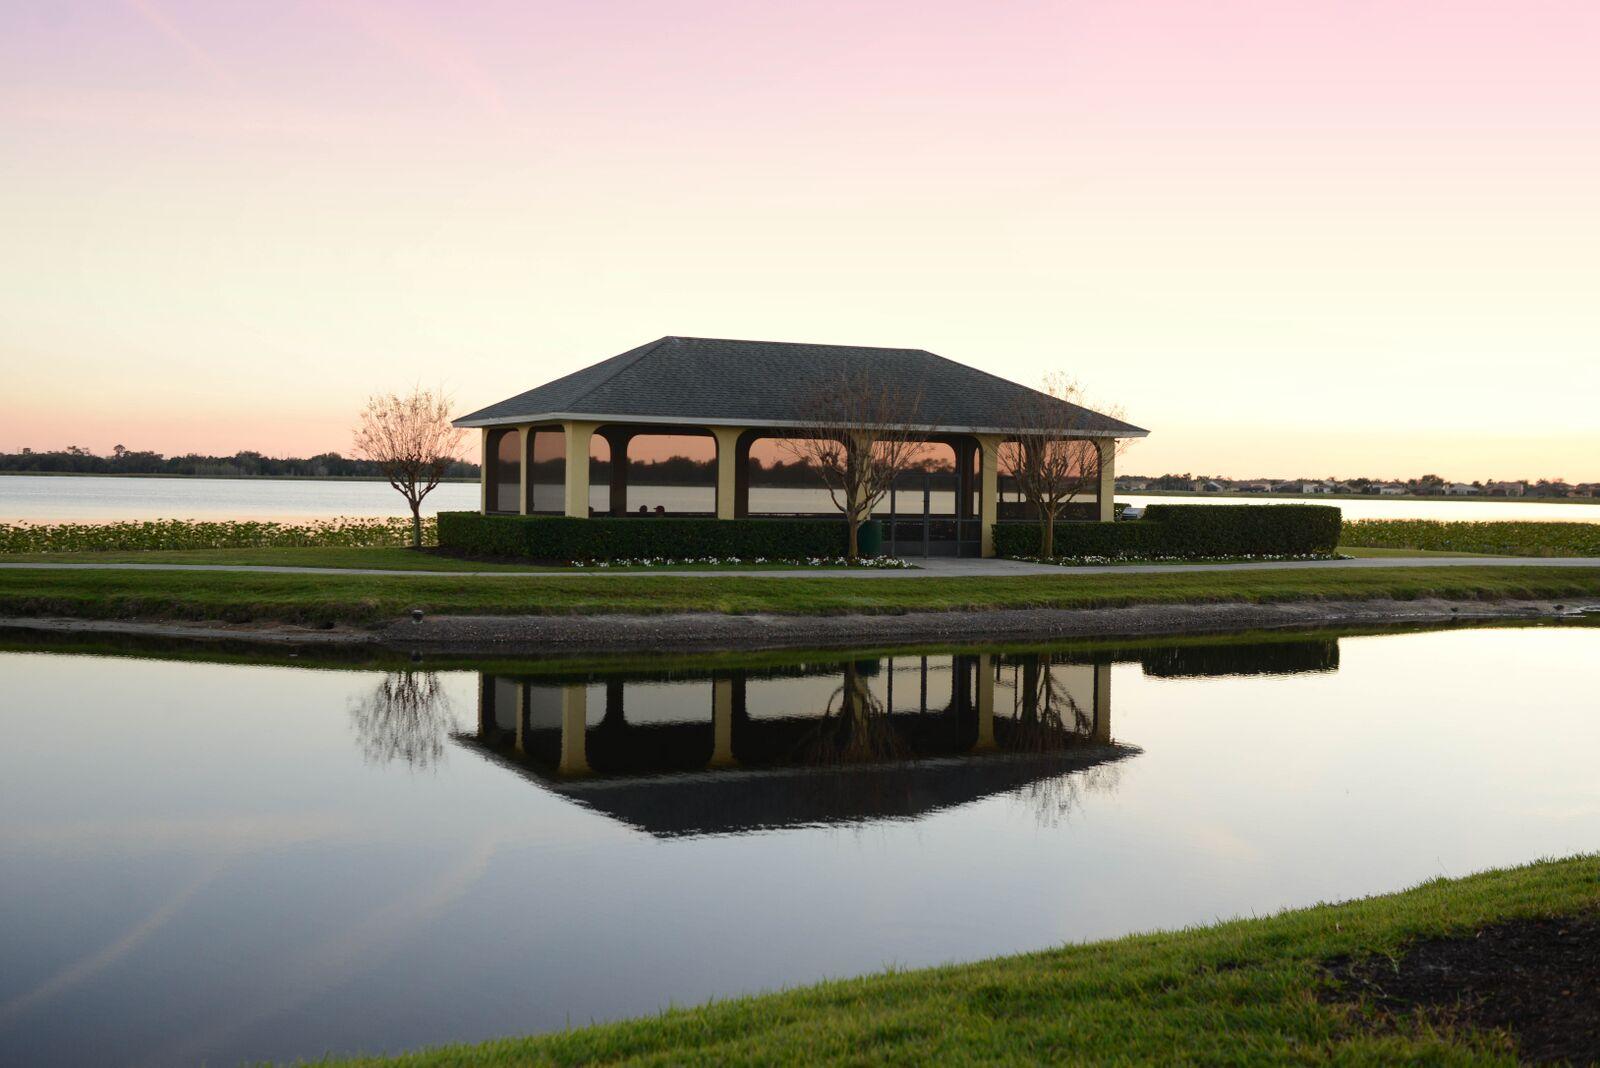 Florida Retirement Community Lake View